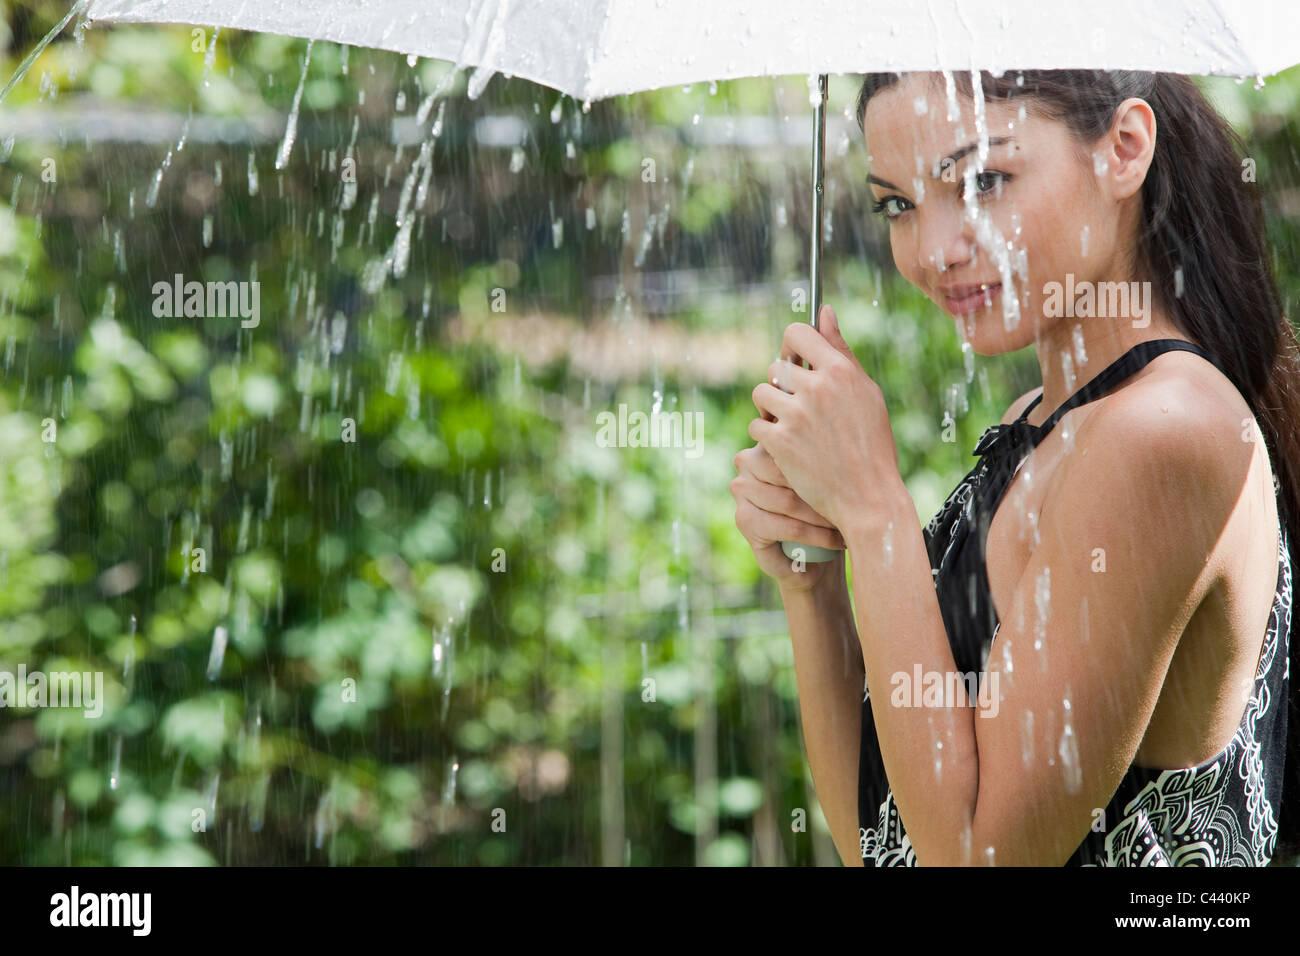 Beautiful Hispanic woman holding umbrella out in the rain - Stock Image